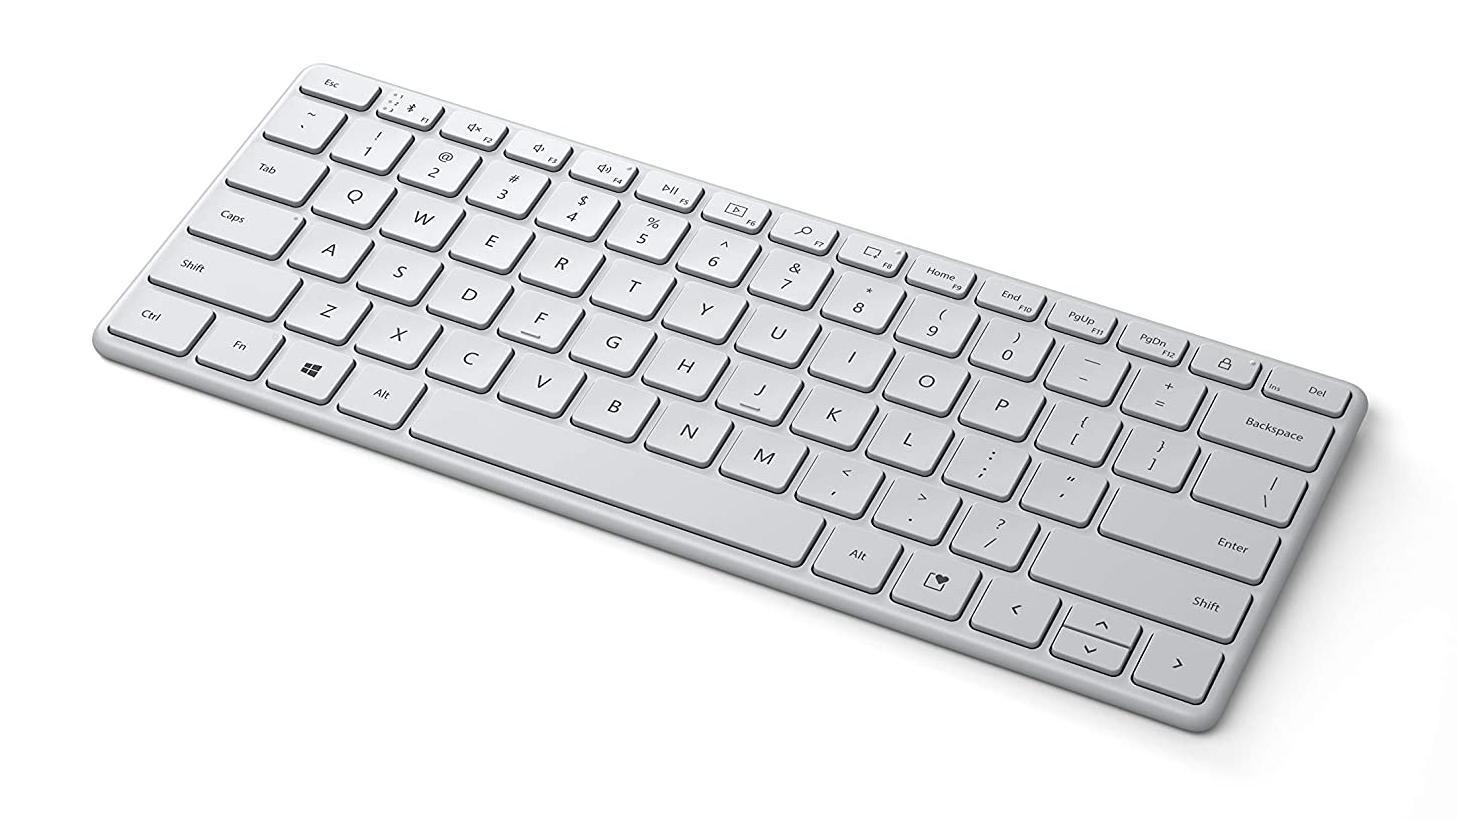 Micrososft Designer Compact Keyboard